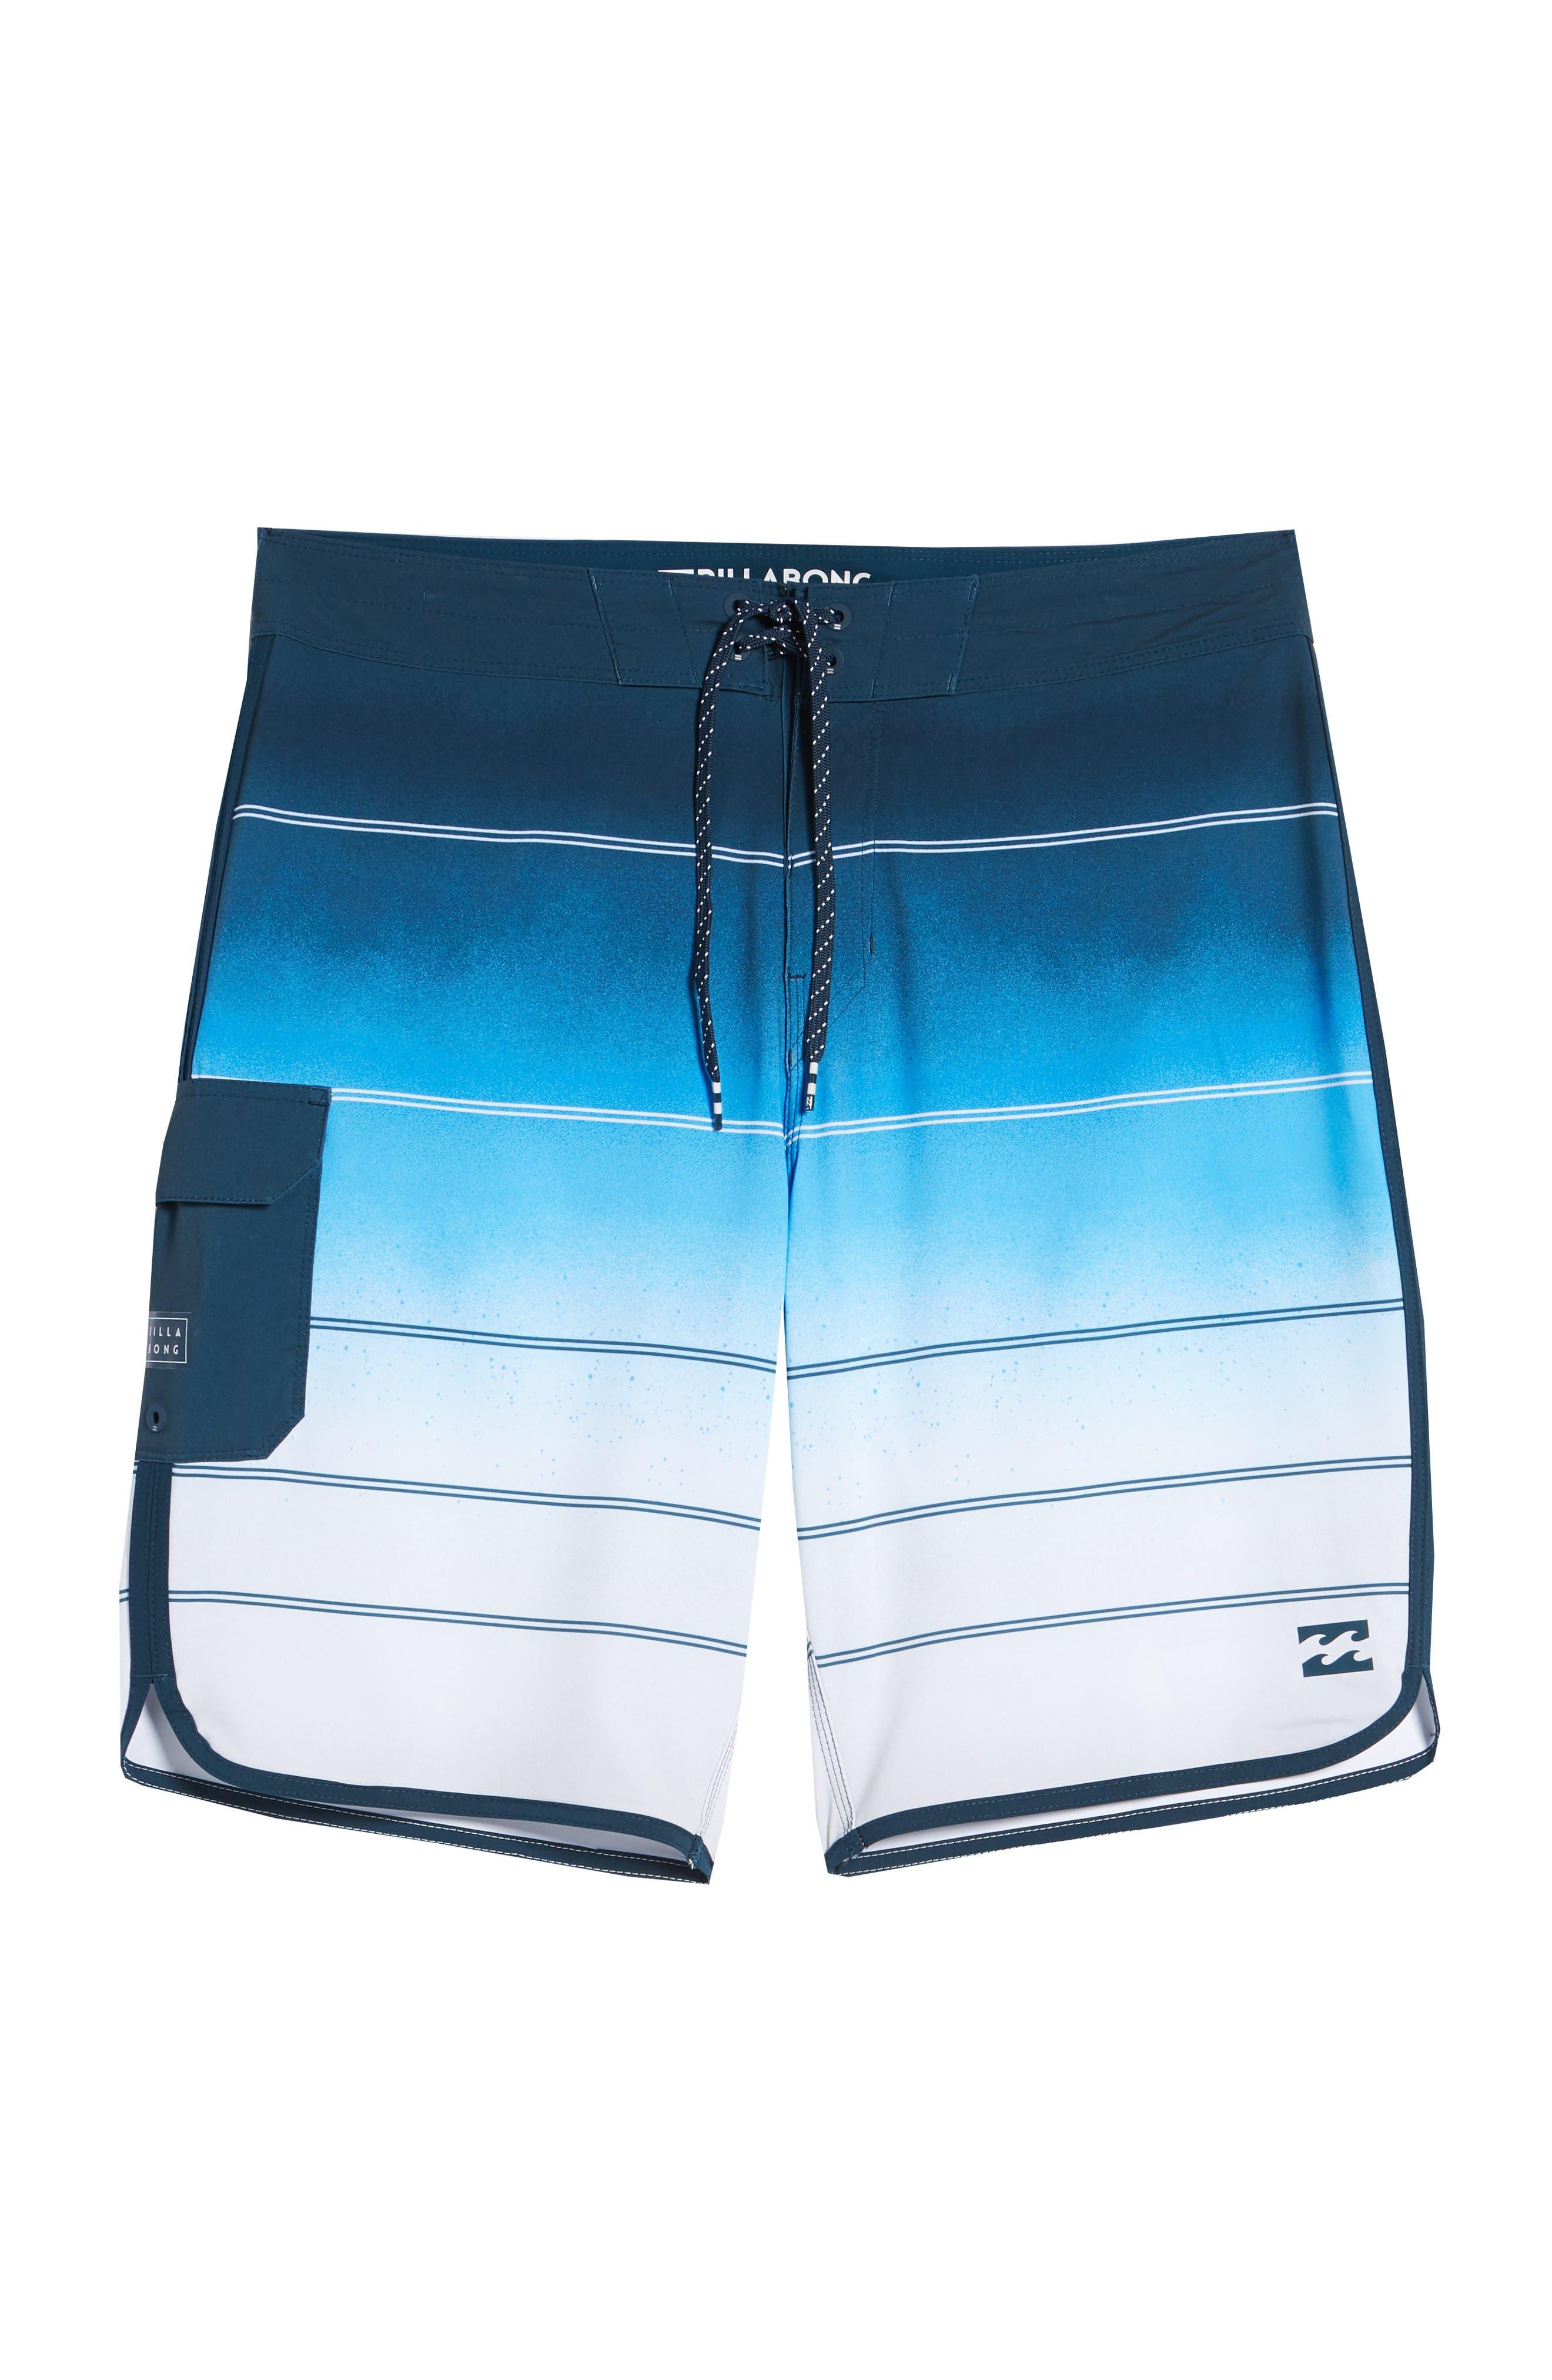 73 X Stripe Board Shorts,                             Alternate thumbnail 6, color,                             428